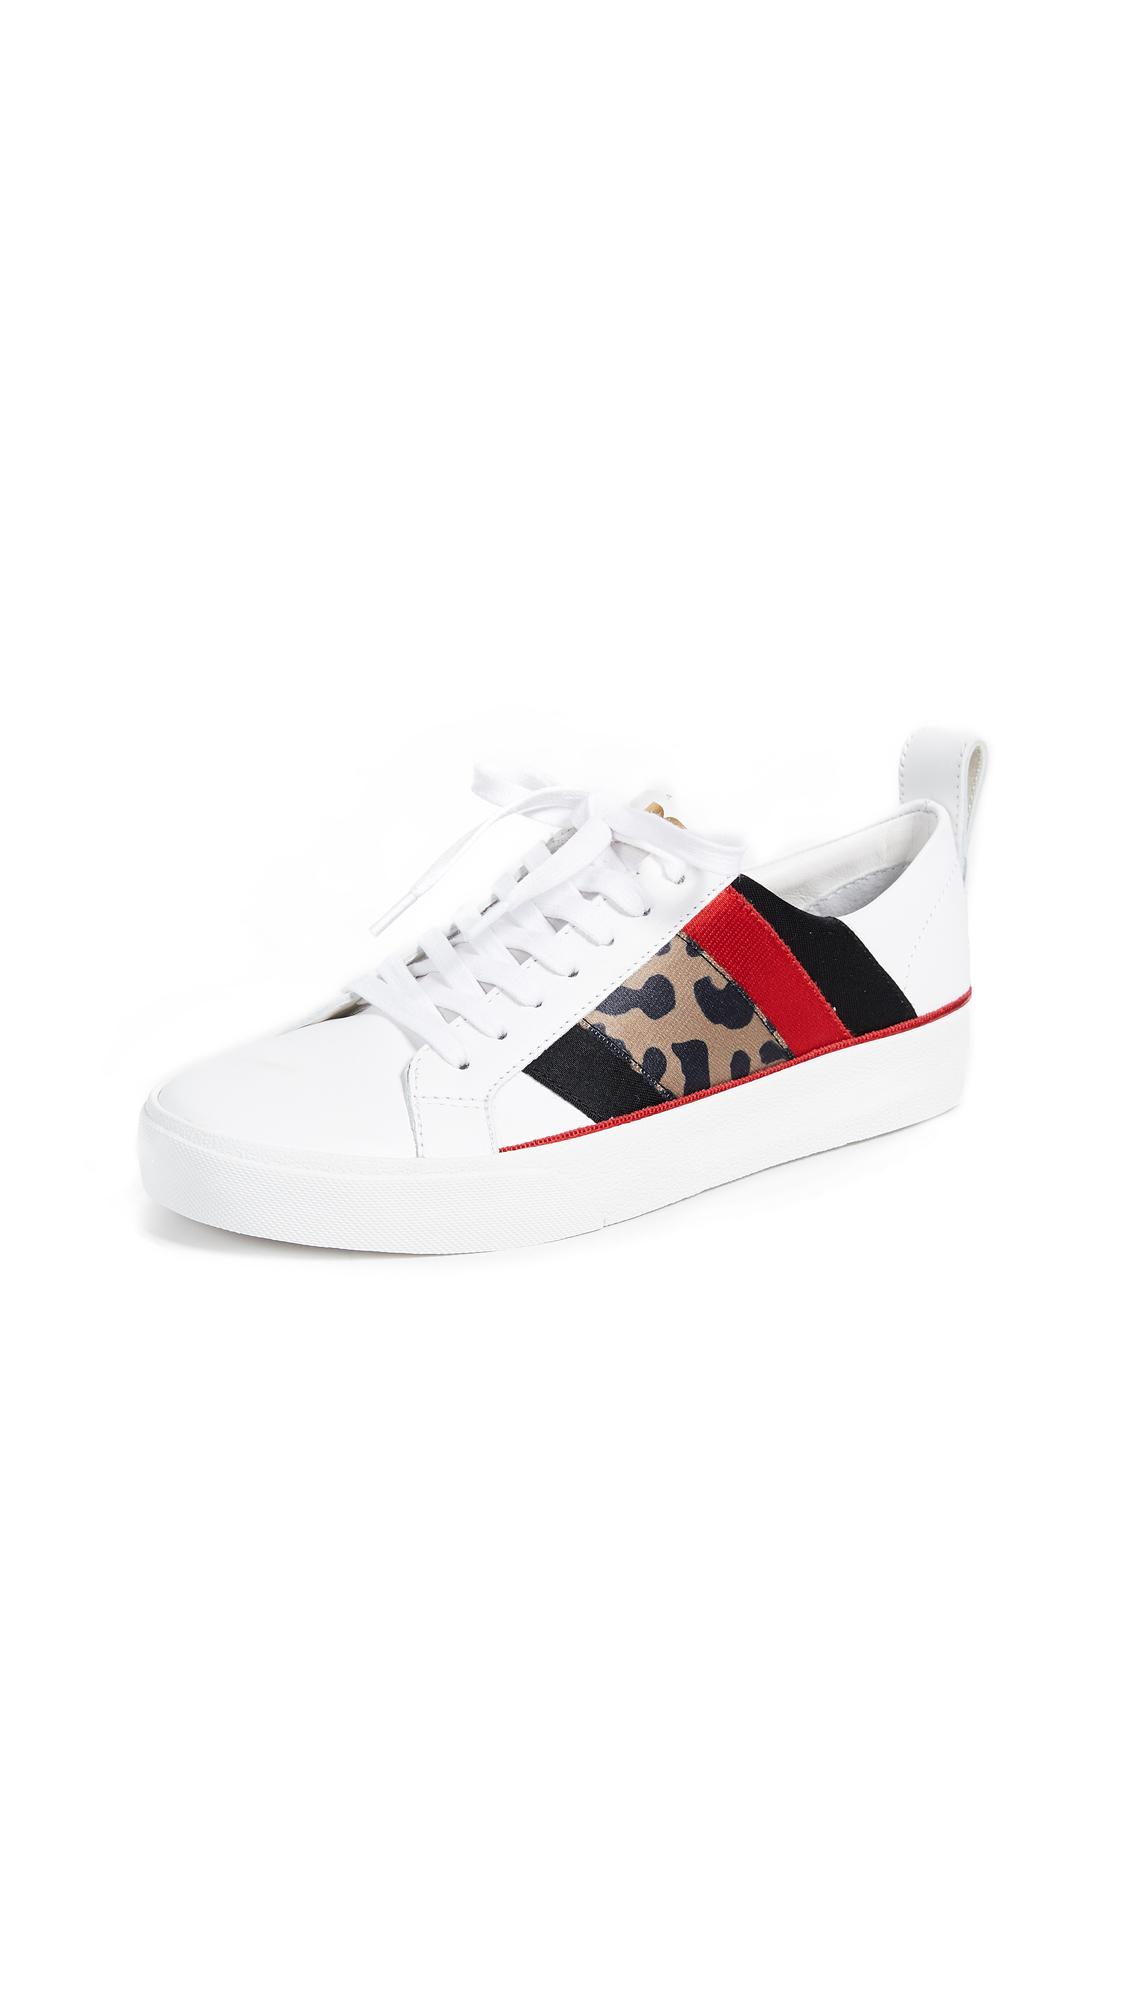 Diane von Furstenberg Tess Sneakers - Leopard Multi